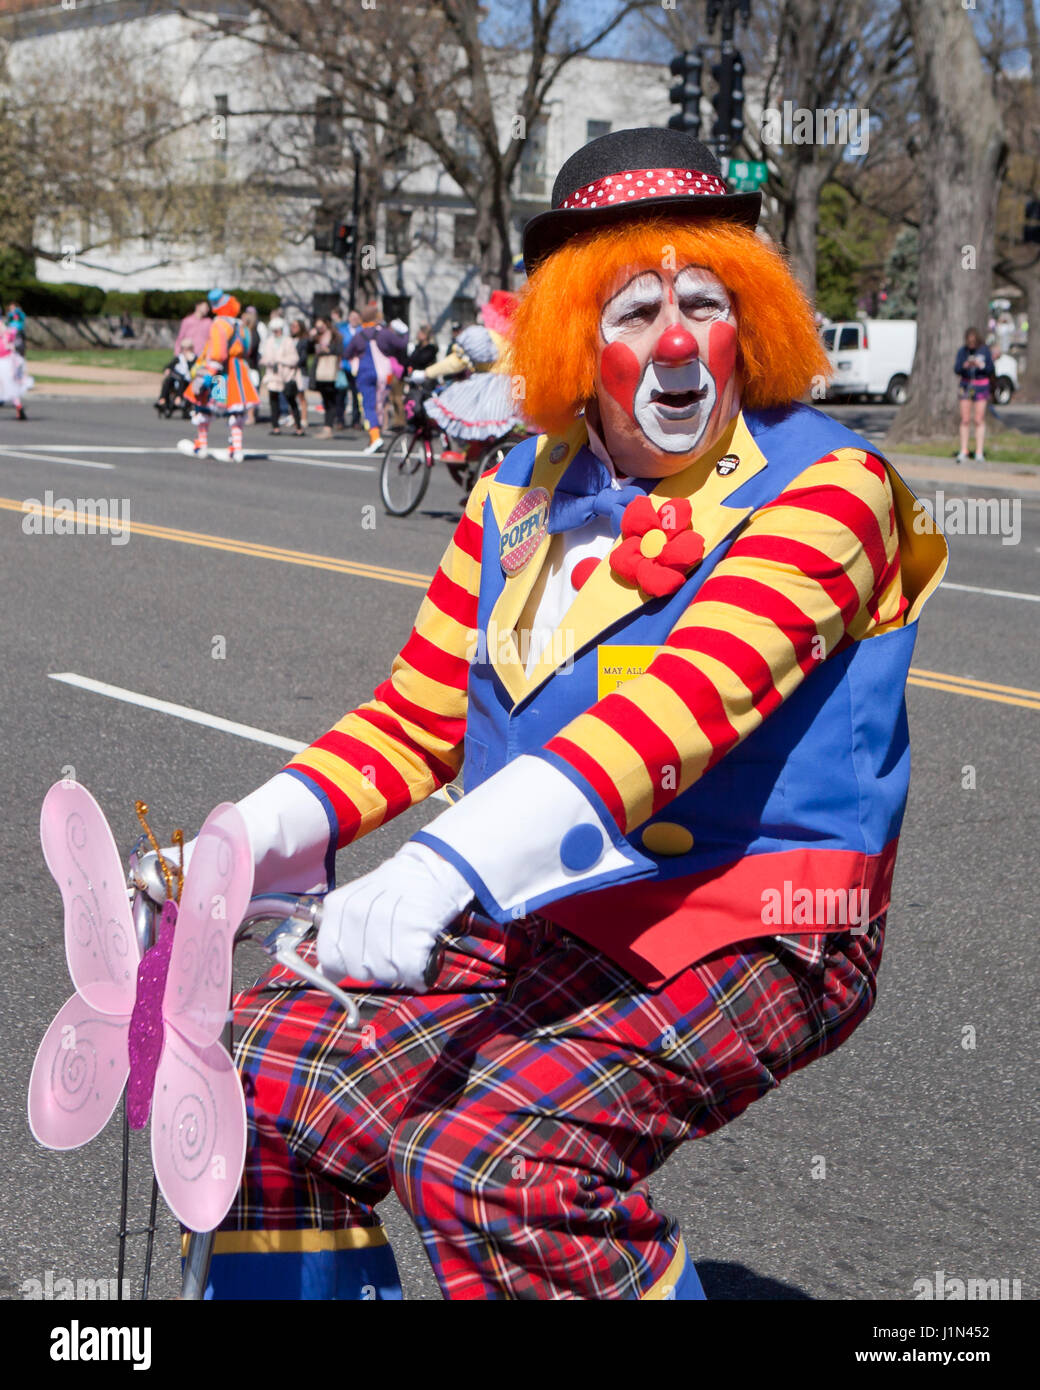 Clown riding  bike during street parade - USA Stock Photo